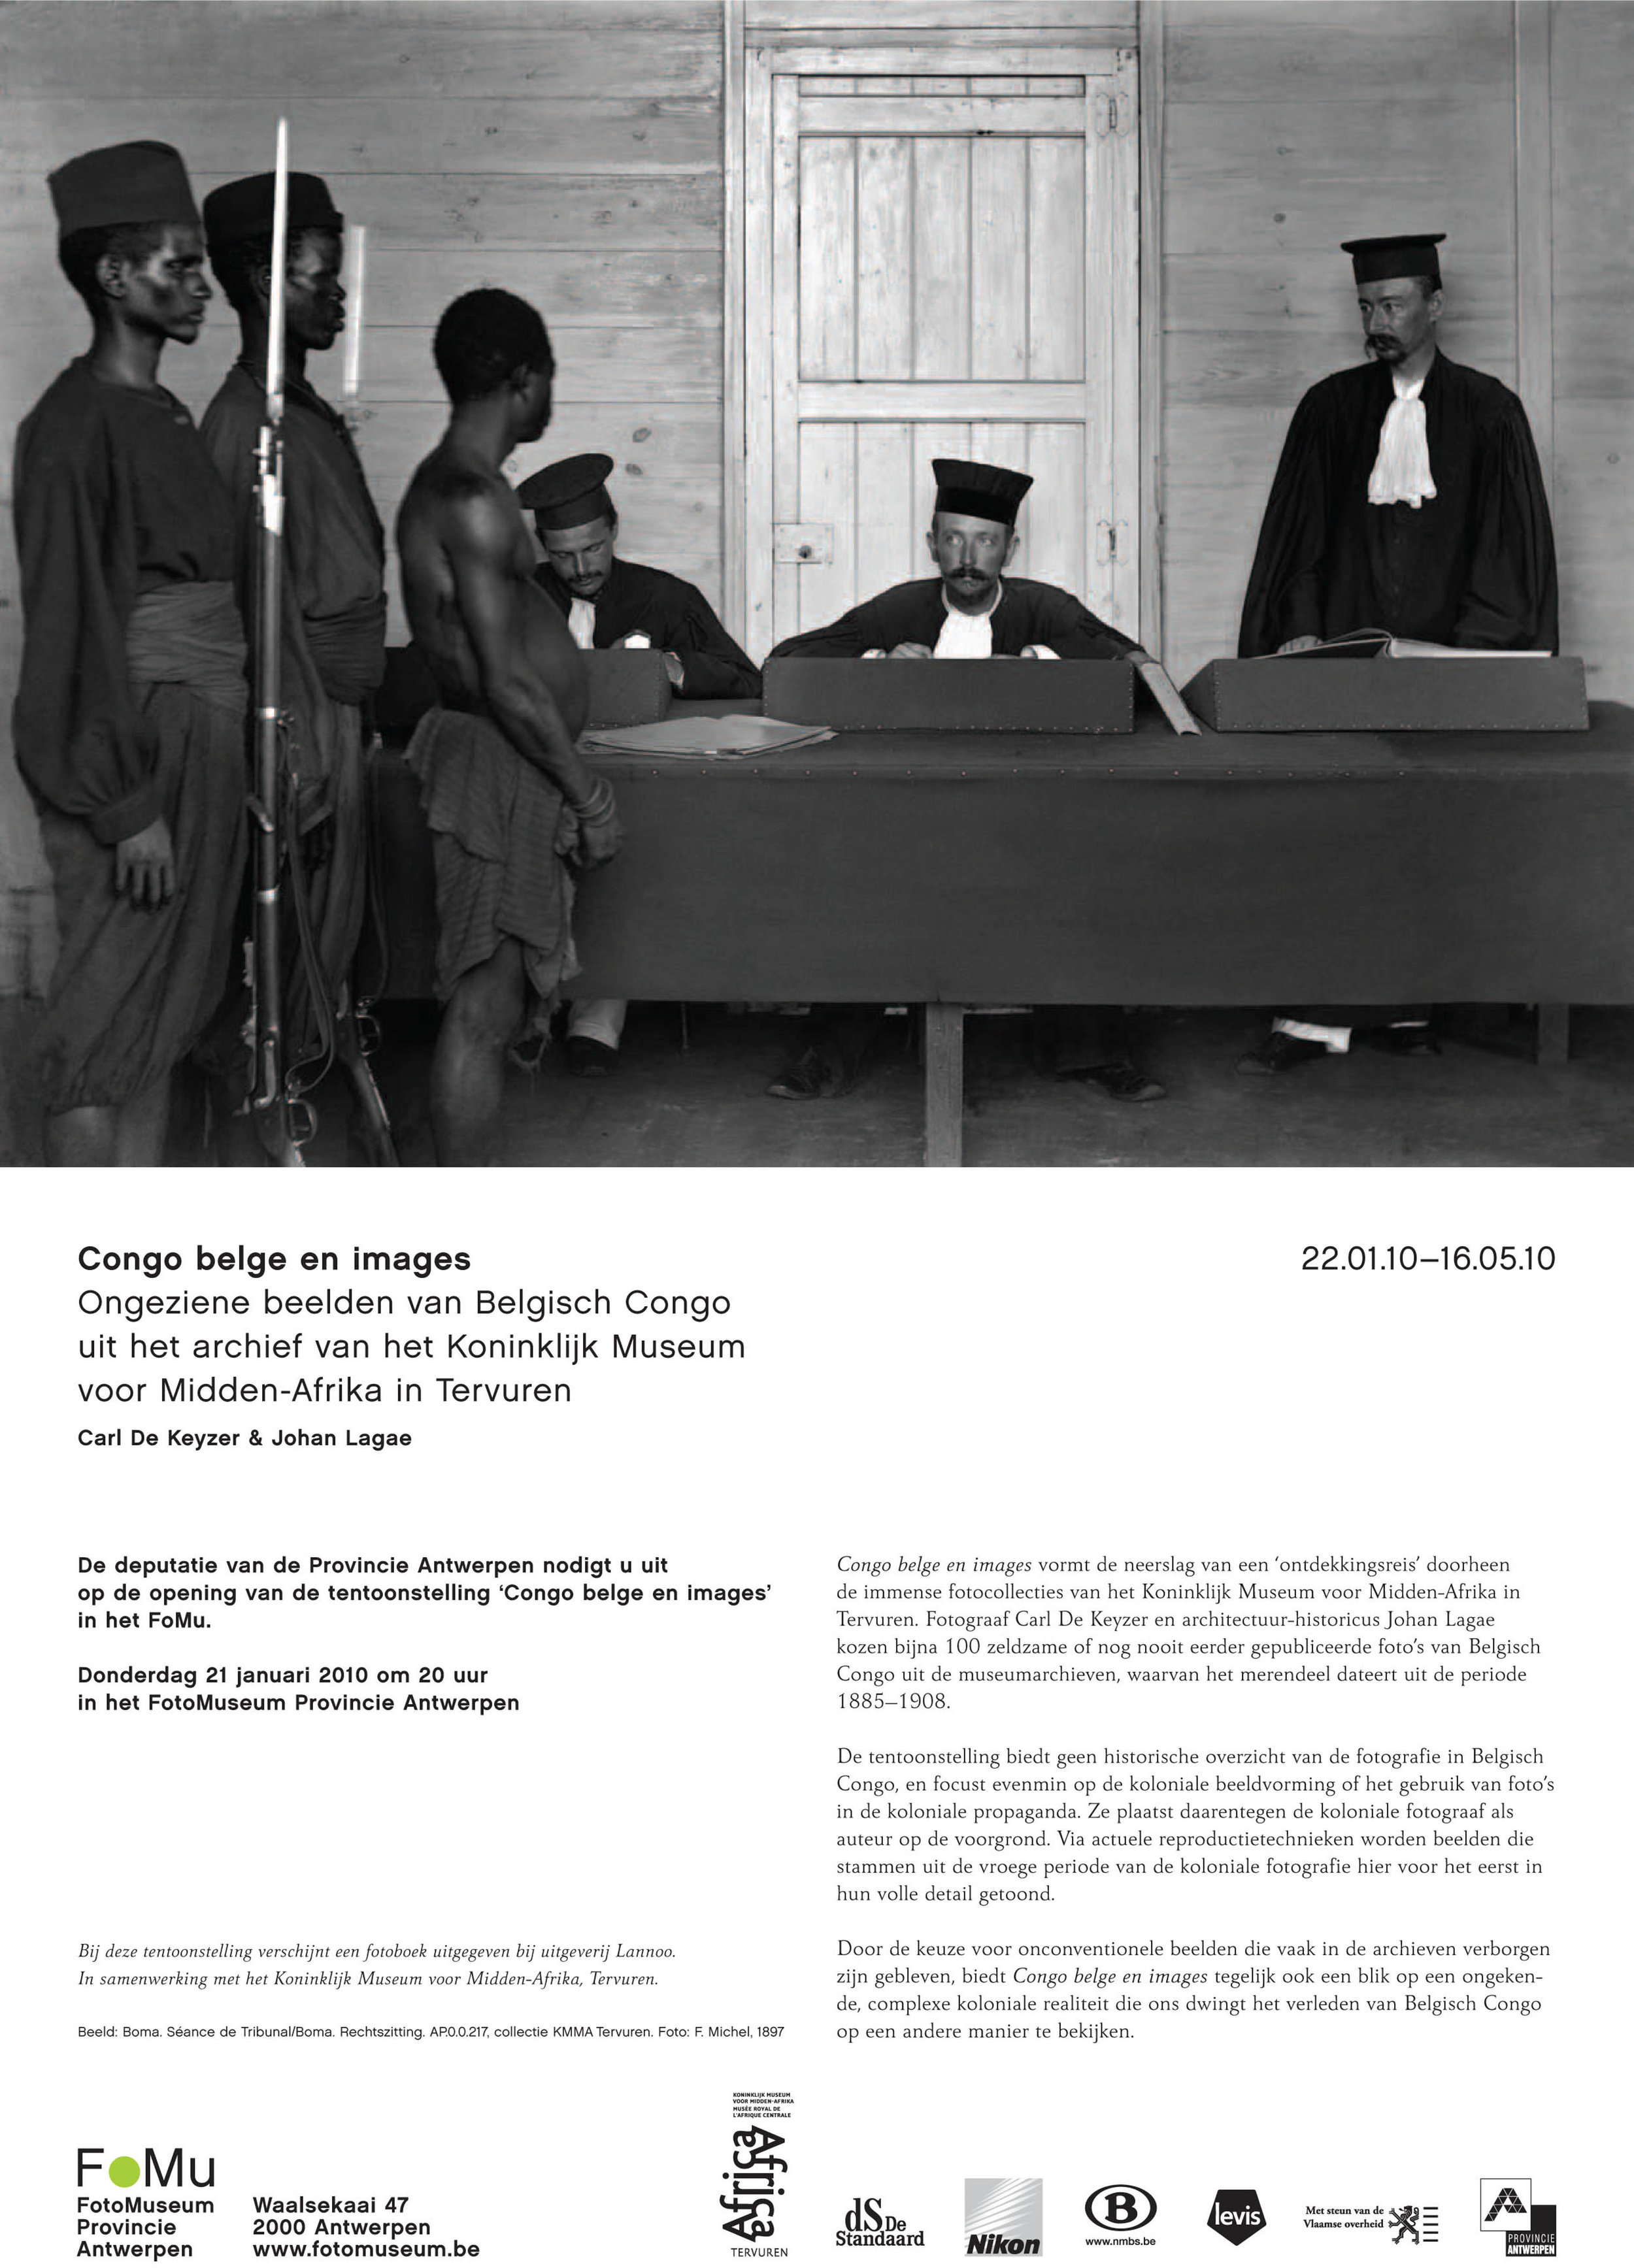 FoMu uitnodiging Congo belge en images_Carl De Keyzer en Johan Lagae.jpg